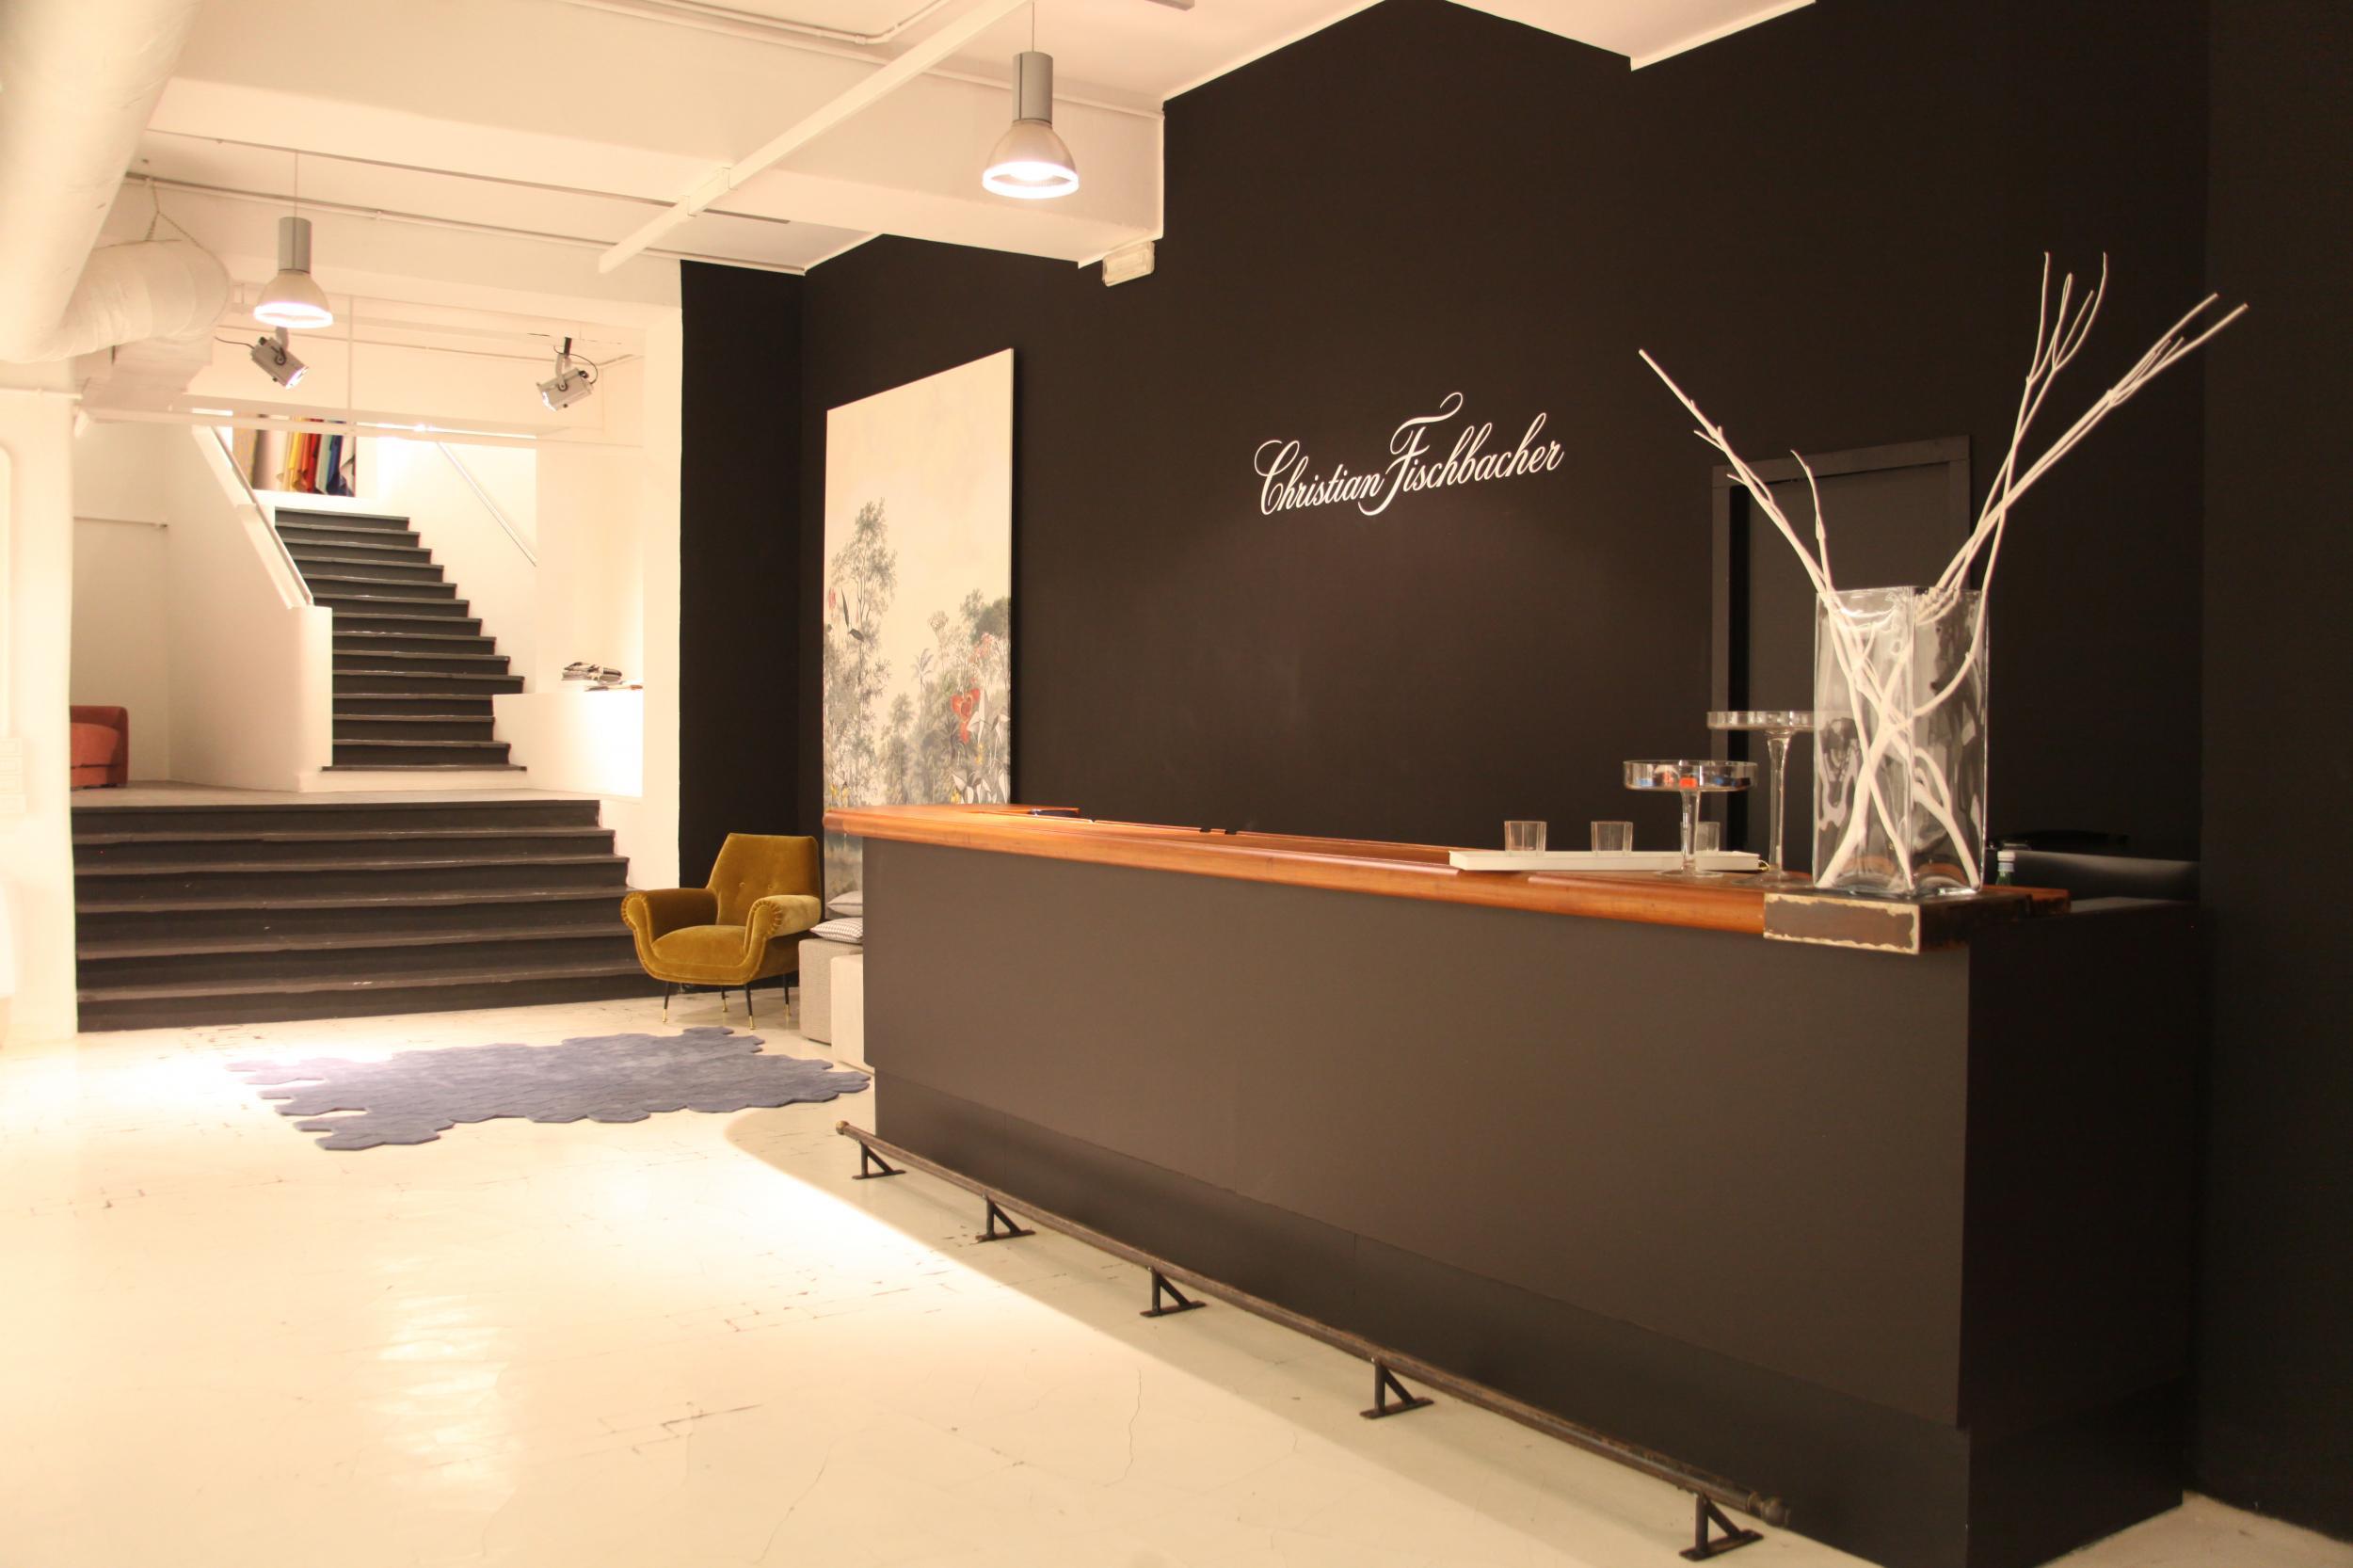 Vibo-Showroom-Fischbacher